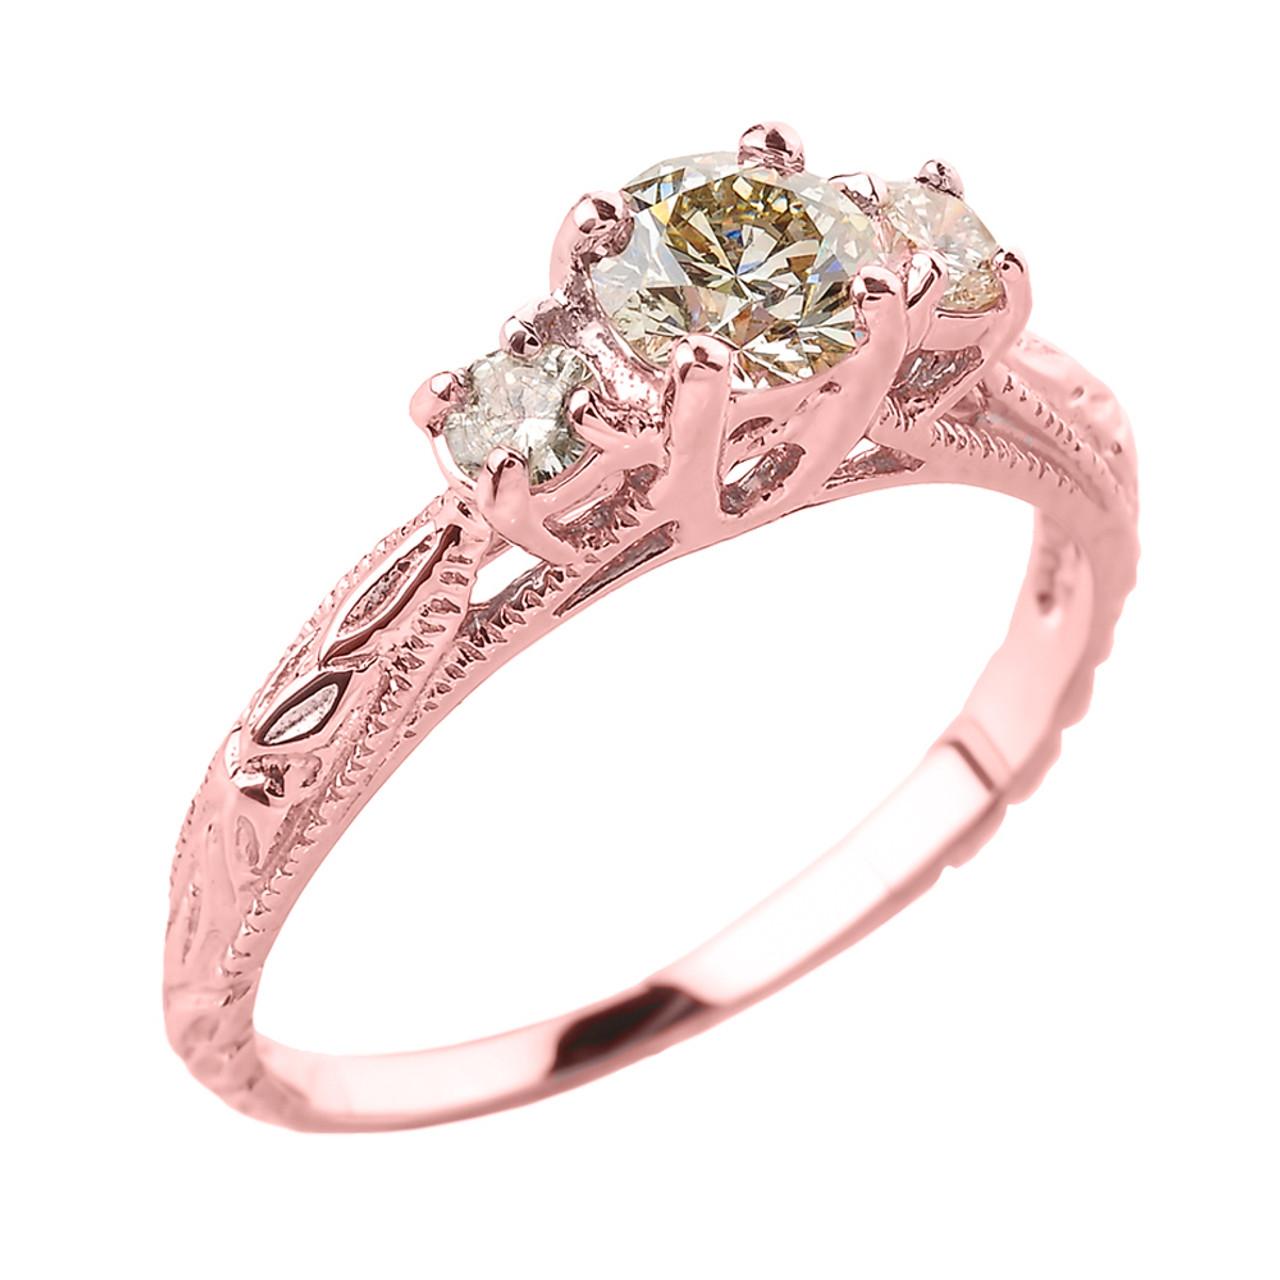 14k White Gold Art Deco 3 Stone Diamond Engagement Wedding Ring